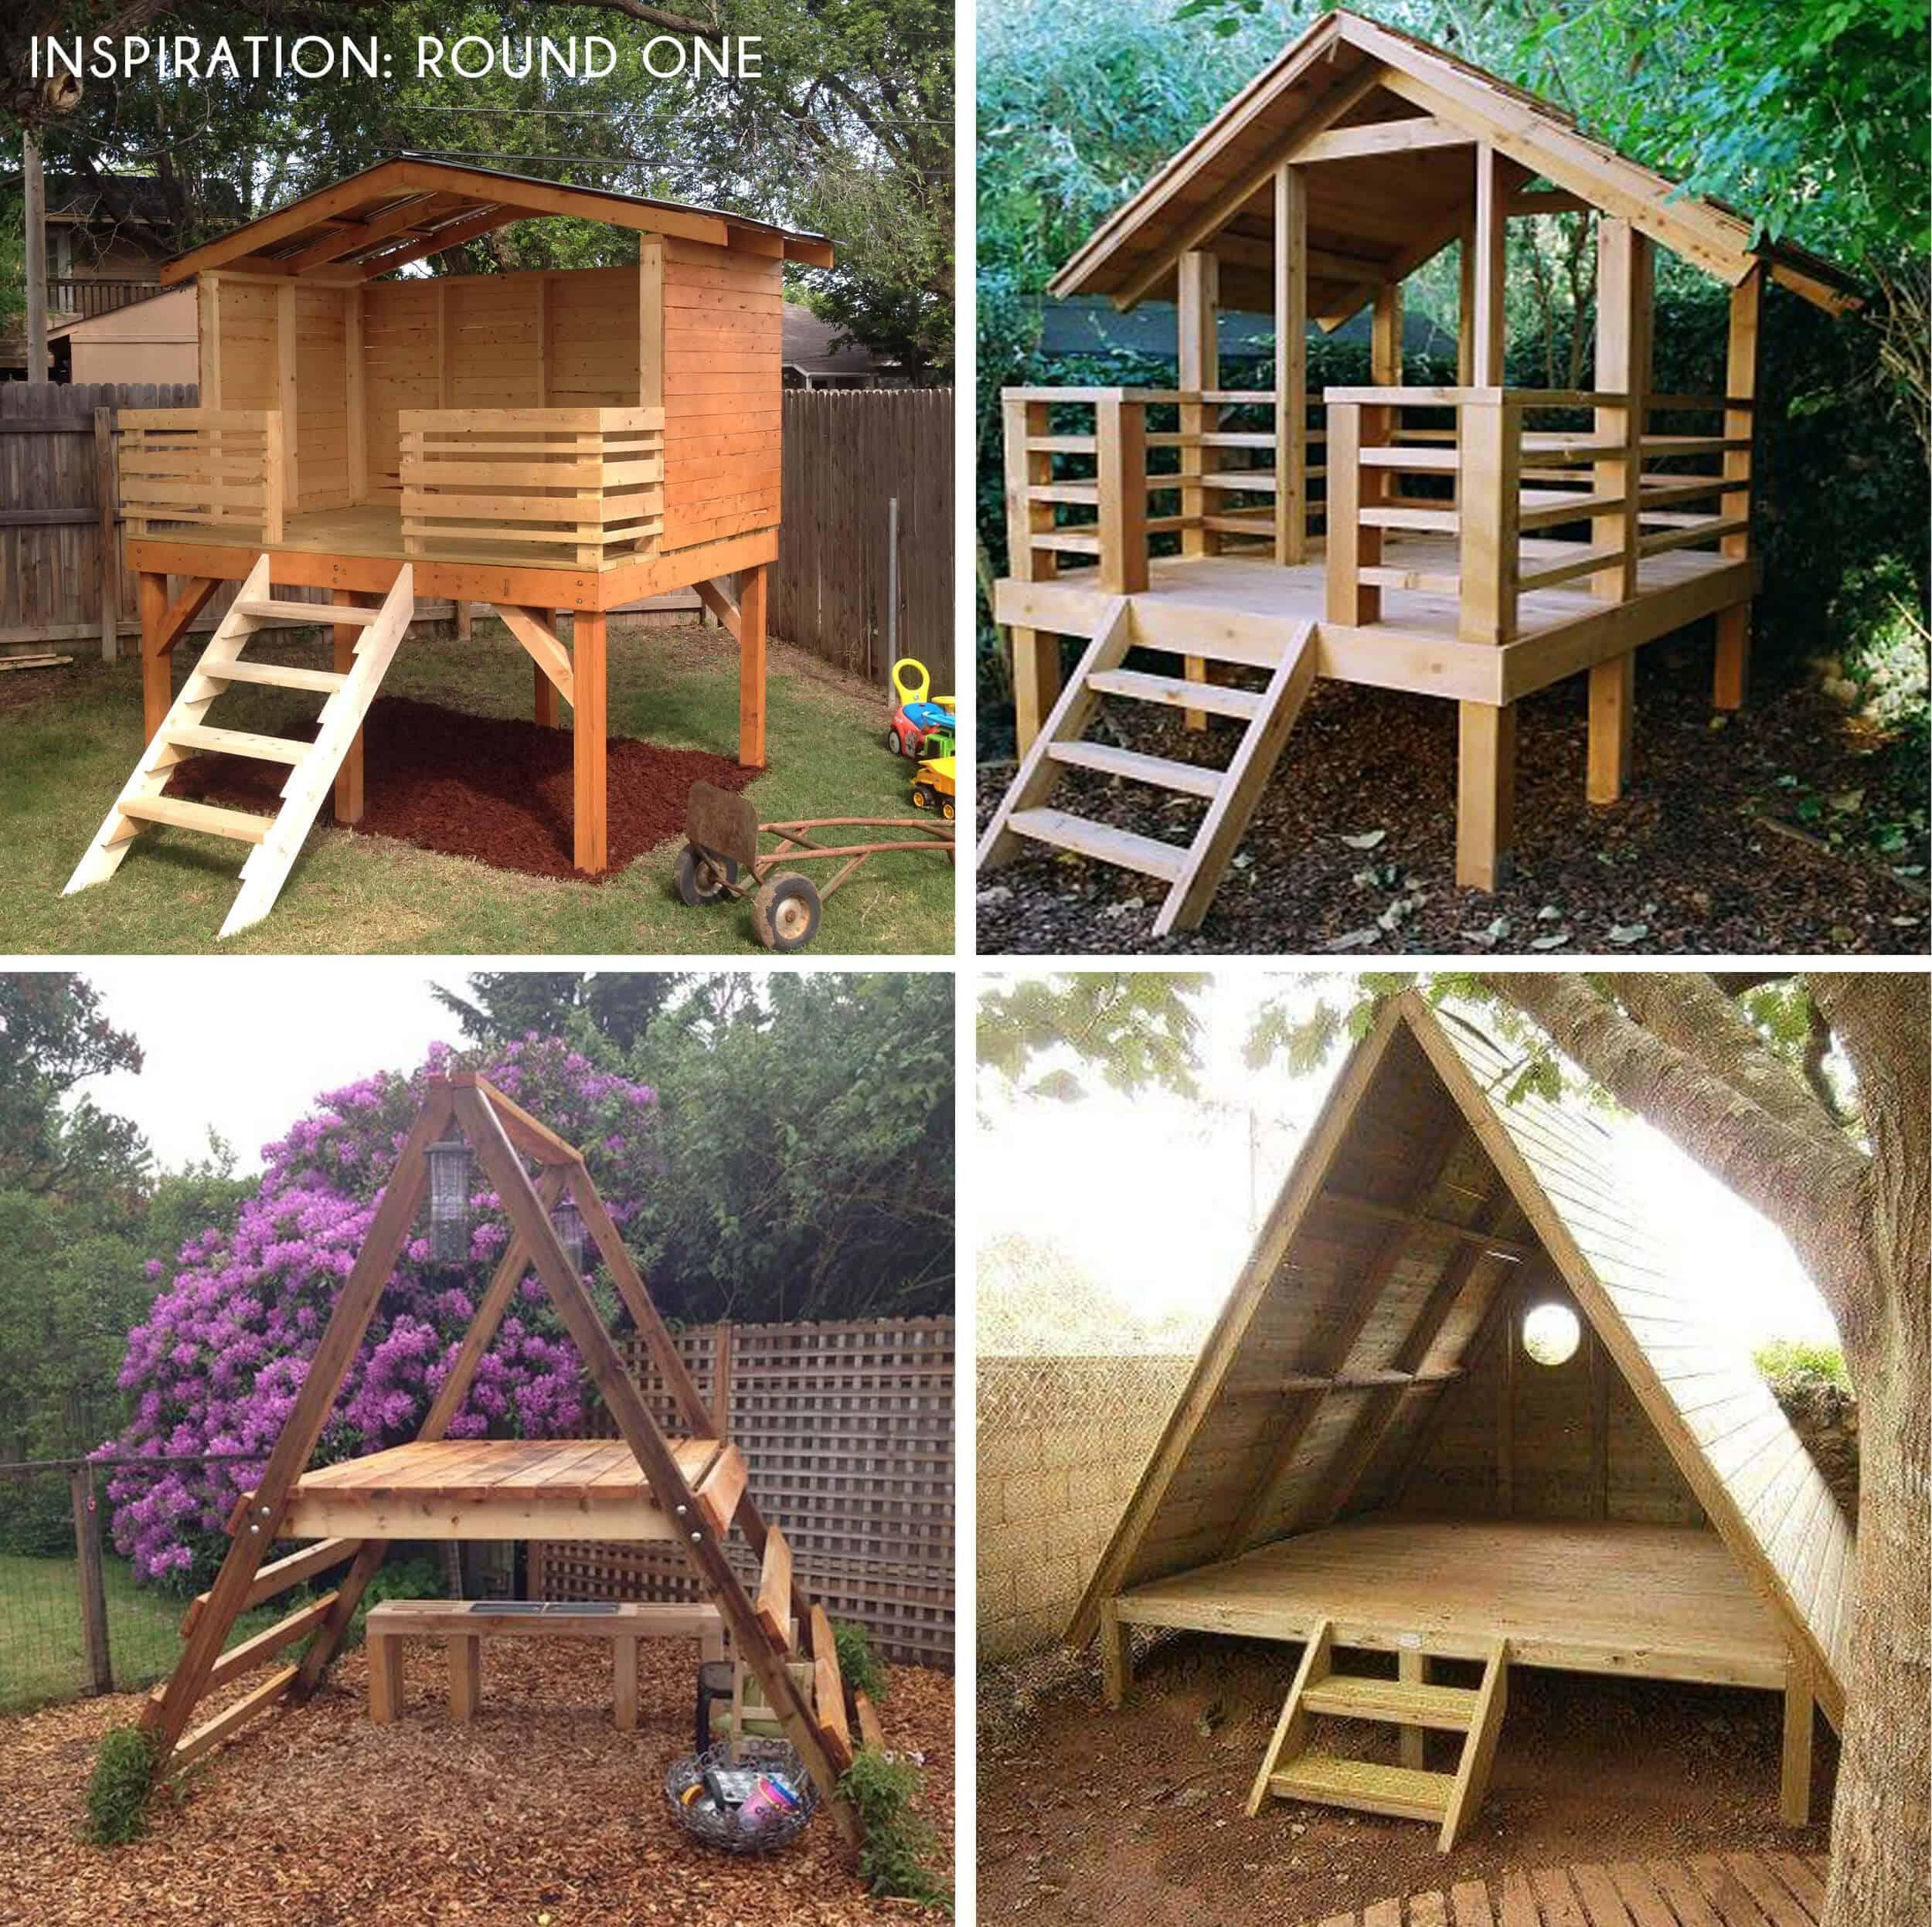 Emily-Henderson_Waverly_Backyard_Playfort_Castle_Inspiration_Round-1